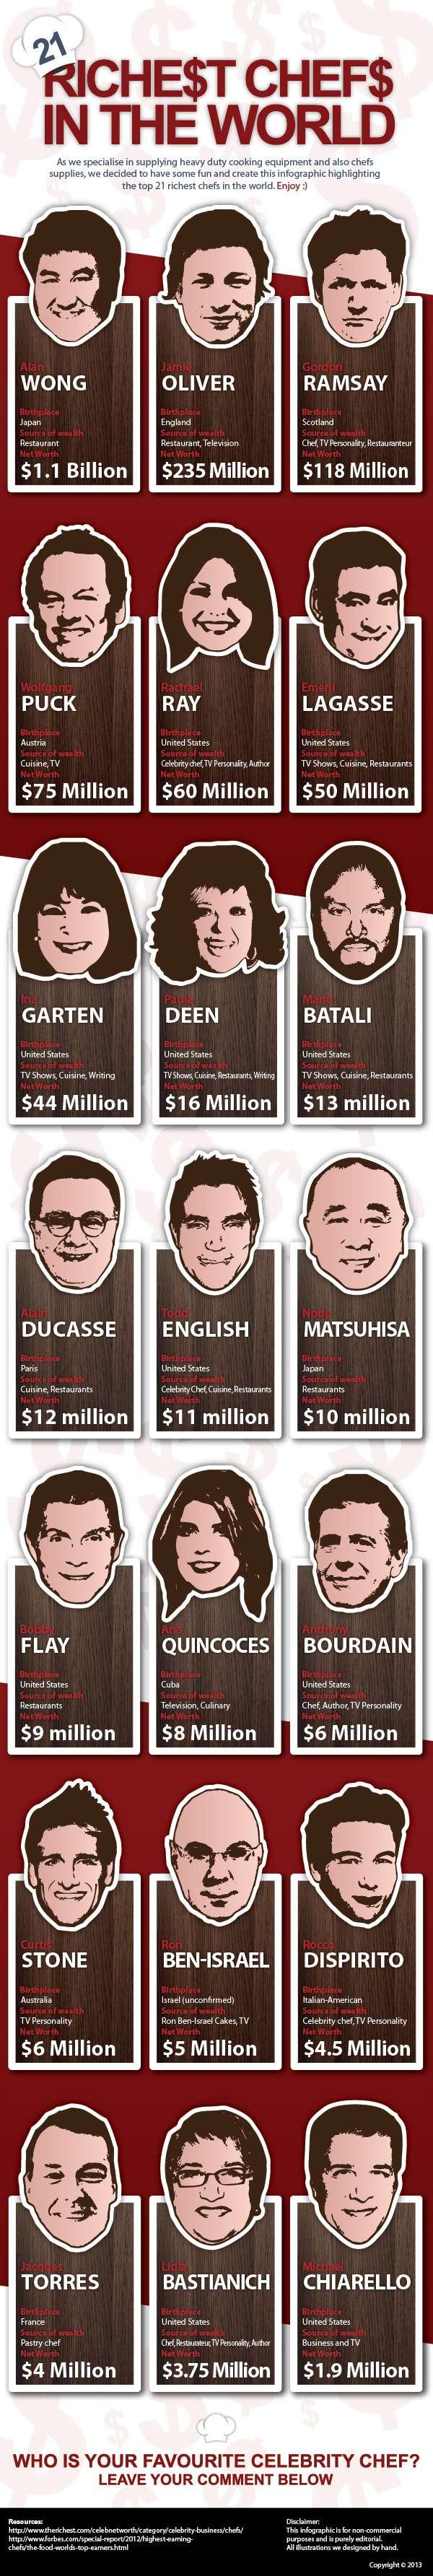 Cei mai bogati bucatari sef din lume in anul 2014 // sursa foto: finedininglovers.com